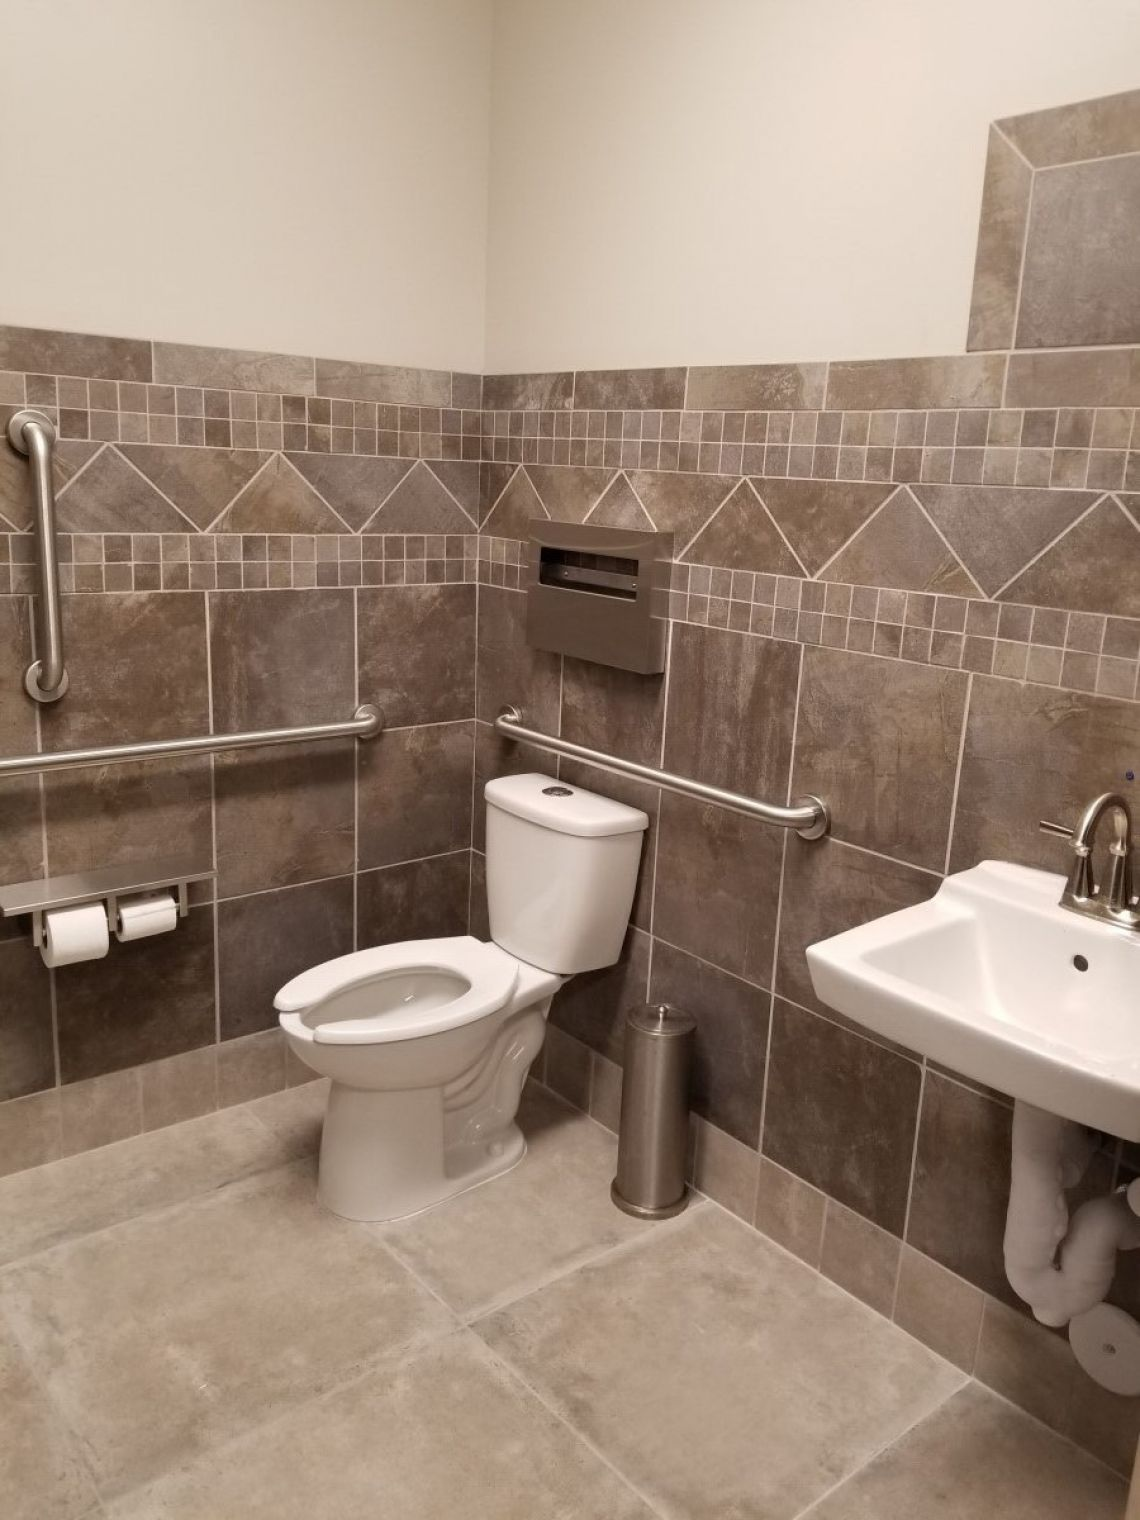 Toilet Repairs & Replacements